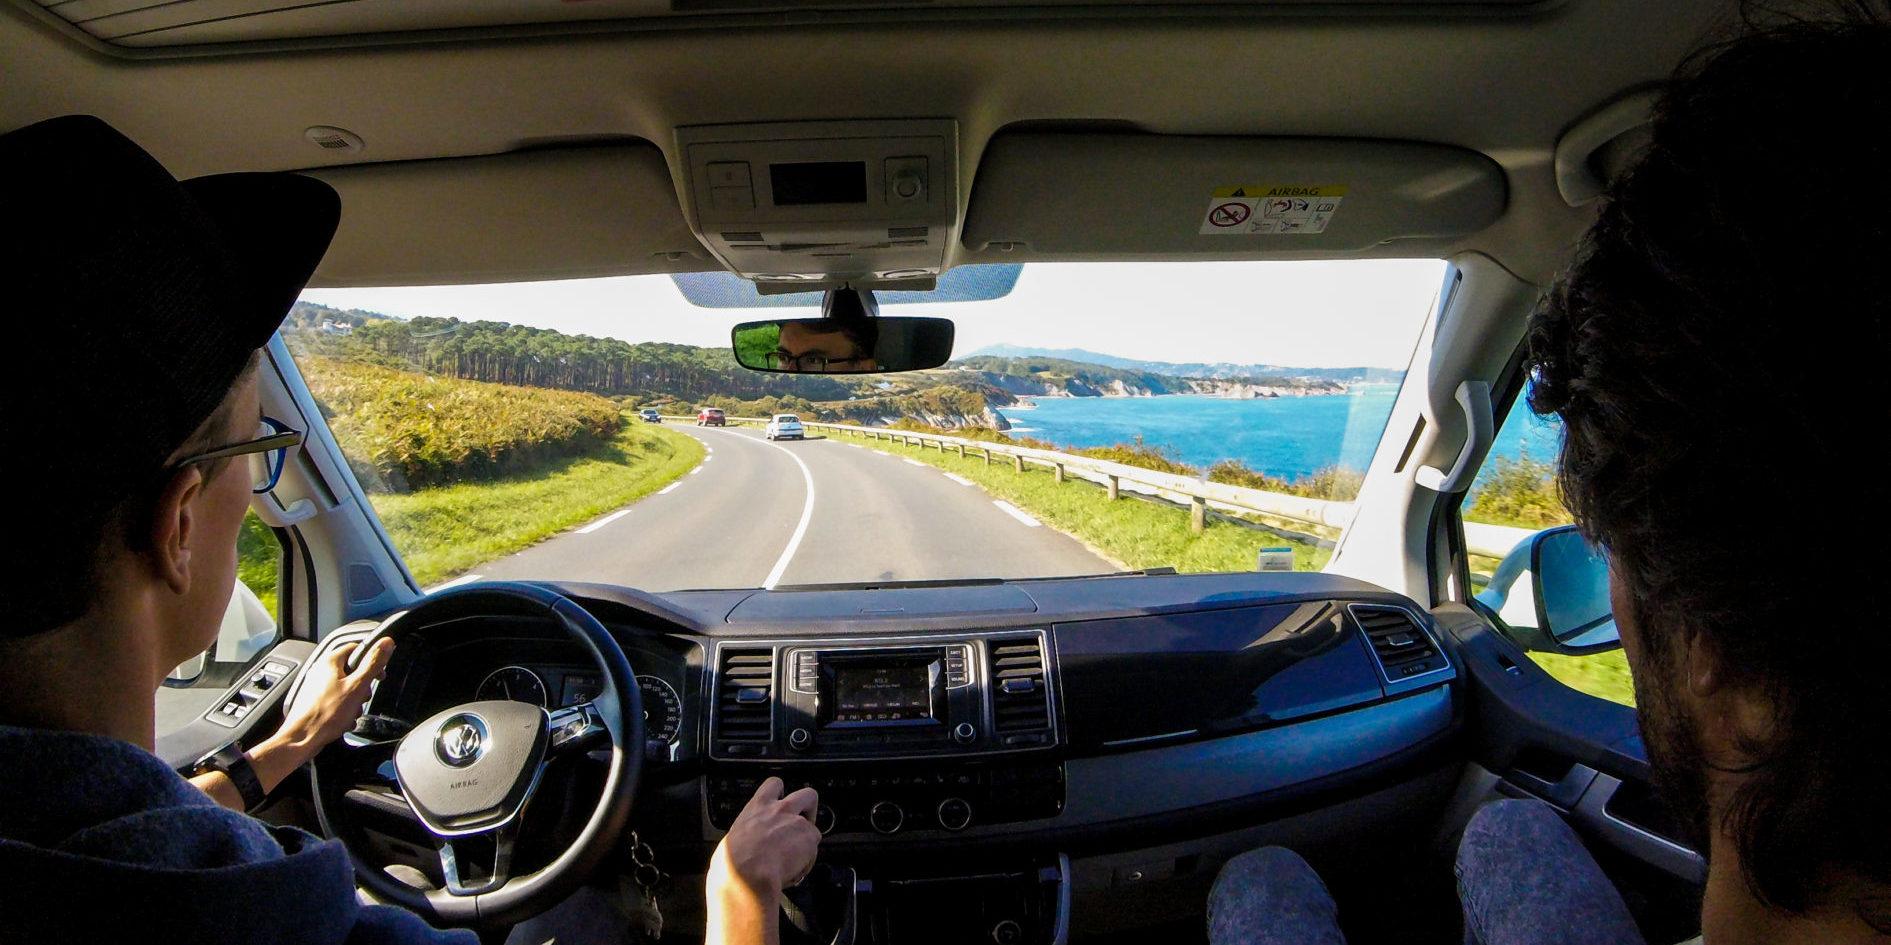 Corsica-Frankrijk-campervans-Blacksheep-CALIFORNIA-BLACKSHEEP-mannen-chauffeur-bijrijder-route-kustweg-on-the-road-road-trip